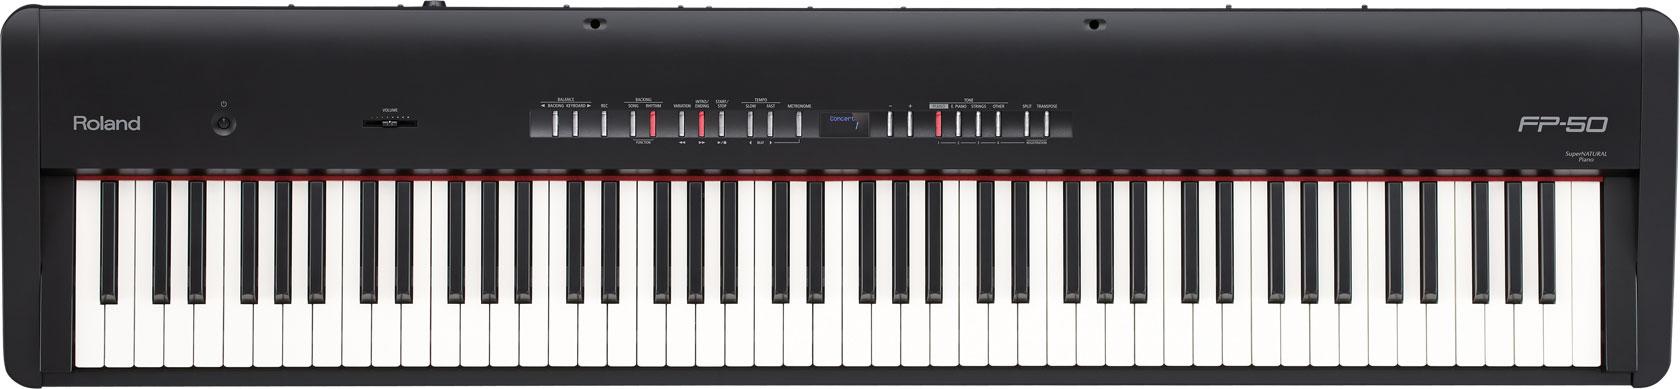 Roland FP-50 Digital Piano_copy